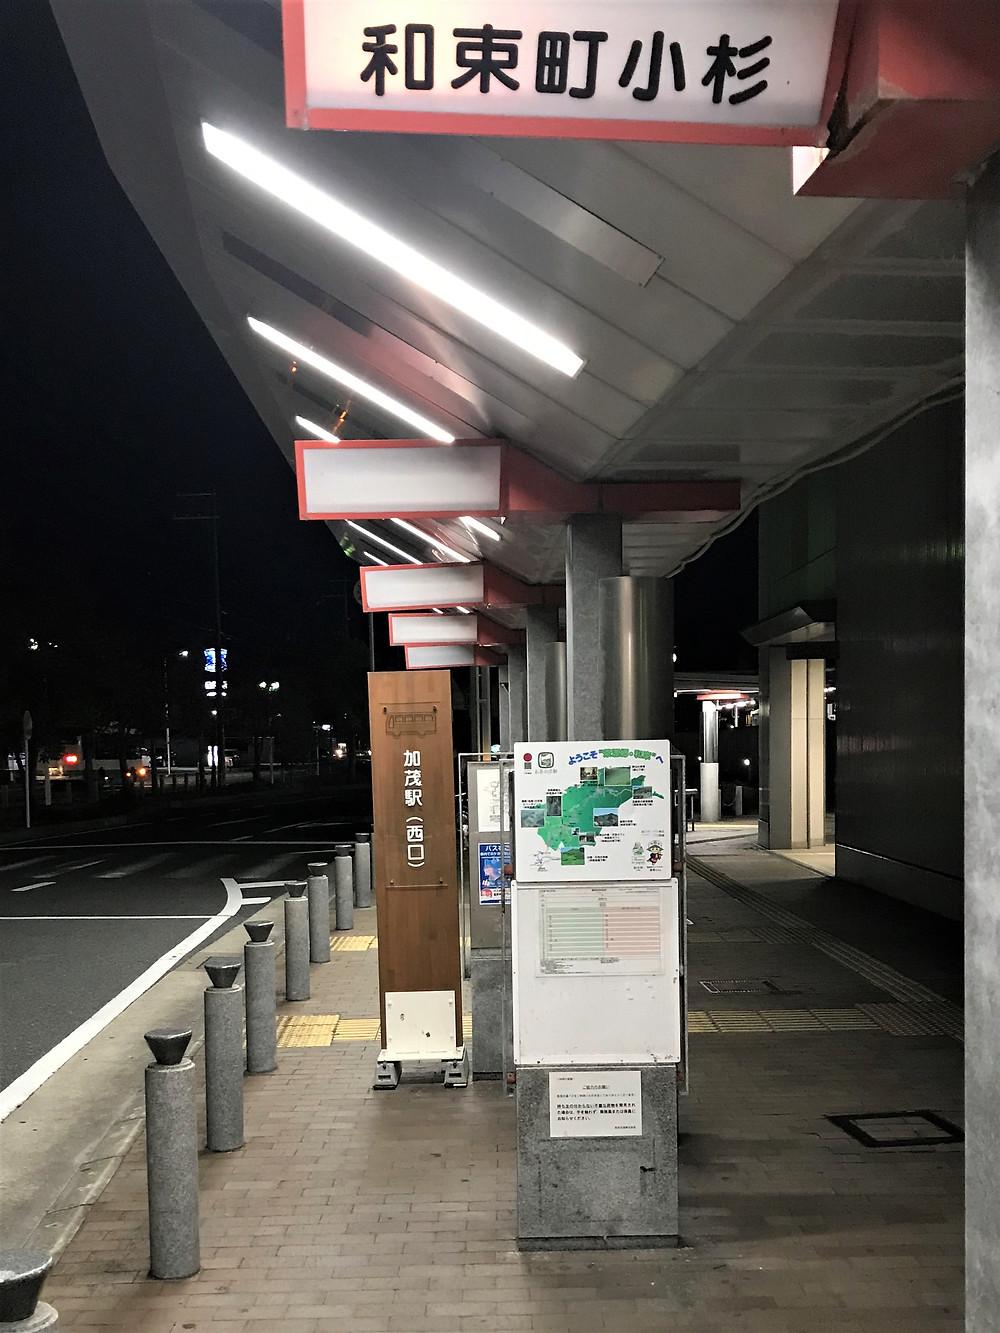 Bus stop at Kamo train station